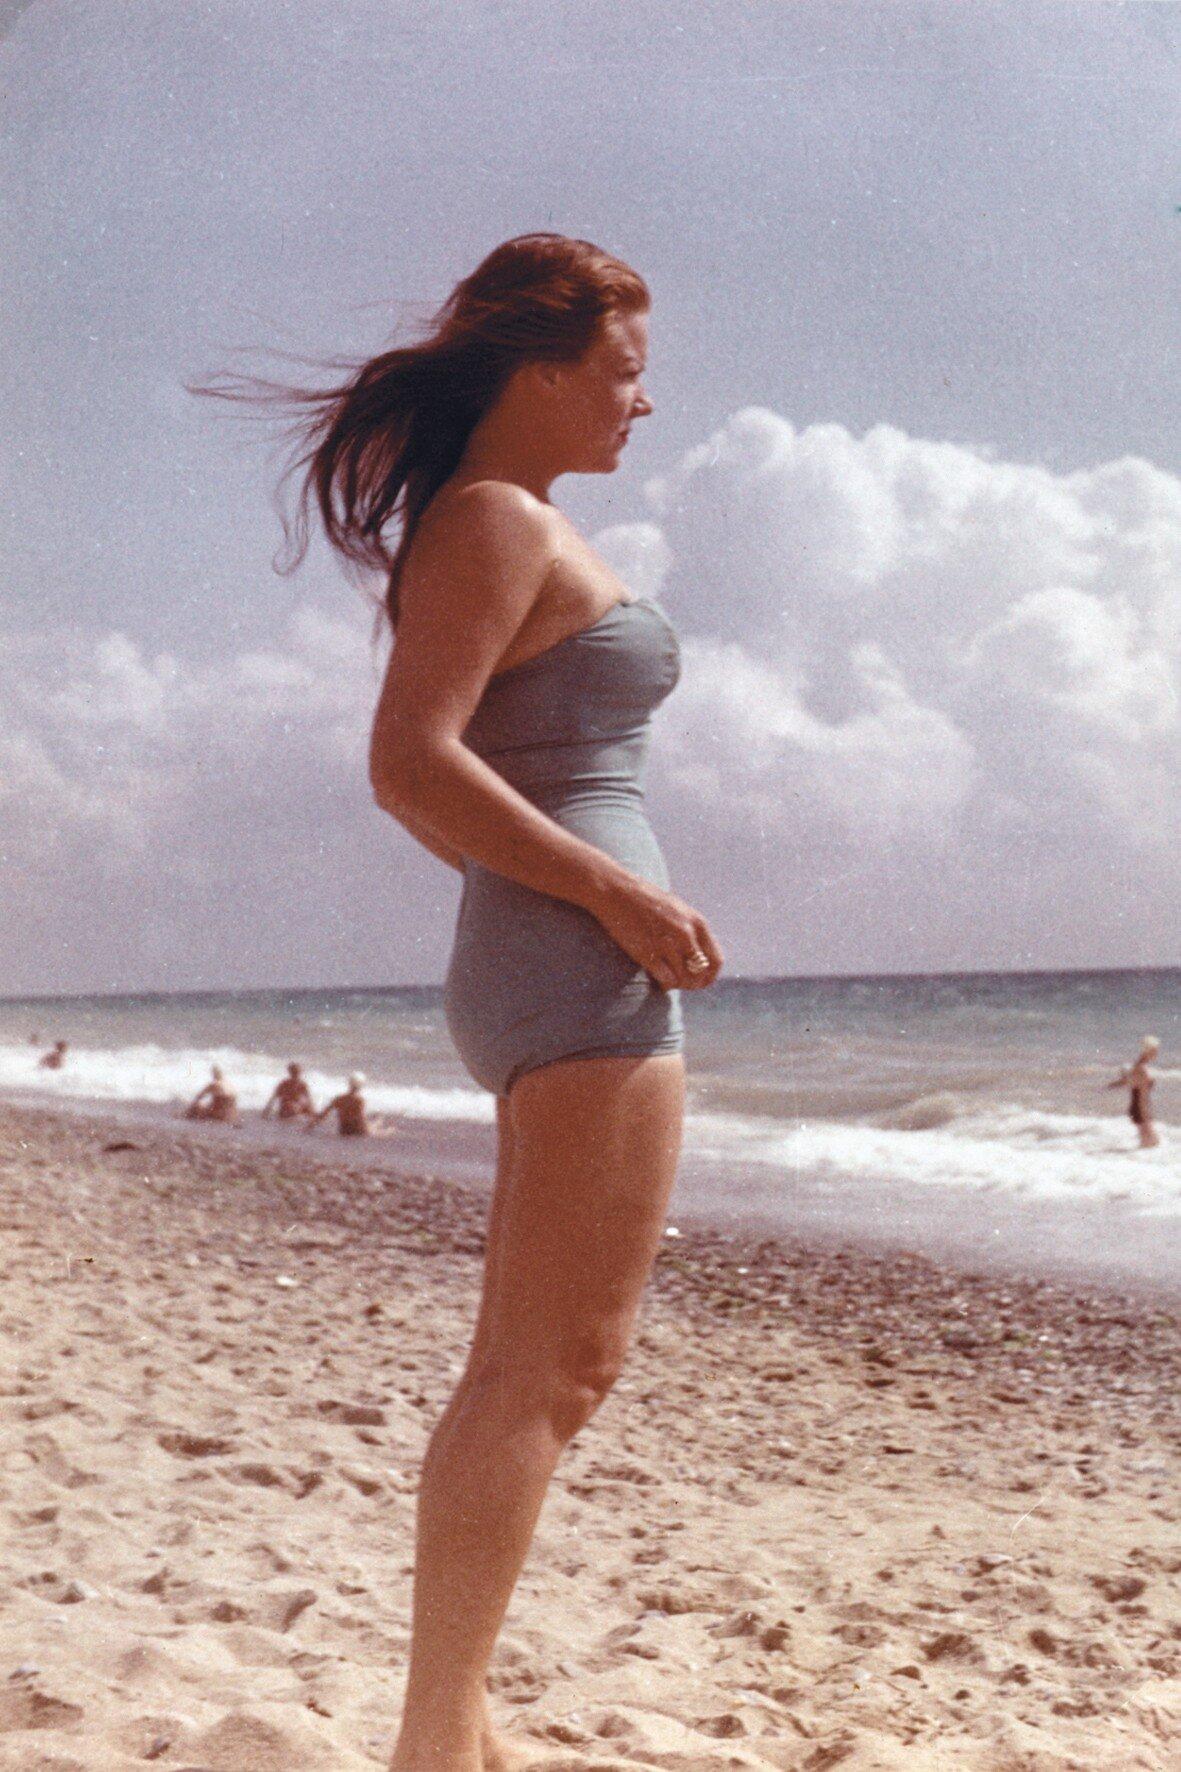 birgitta_beach.jpg